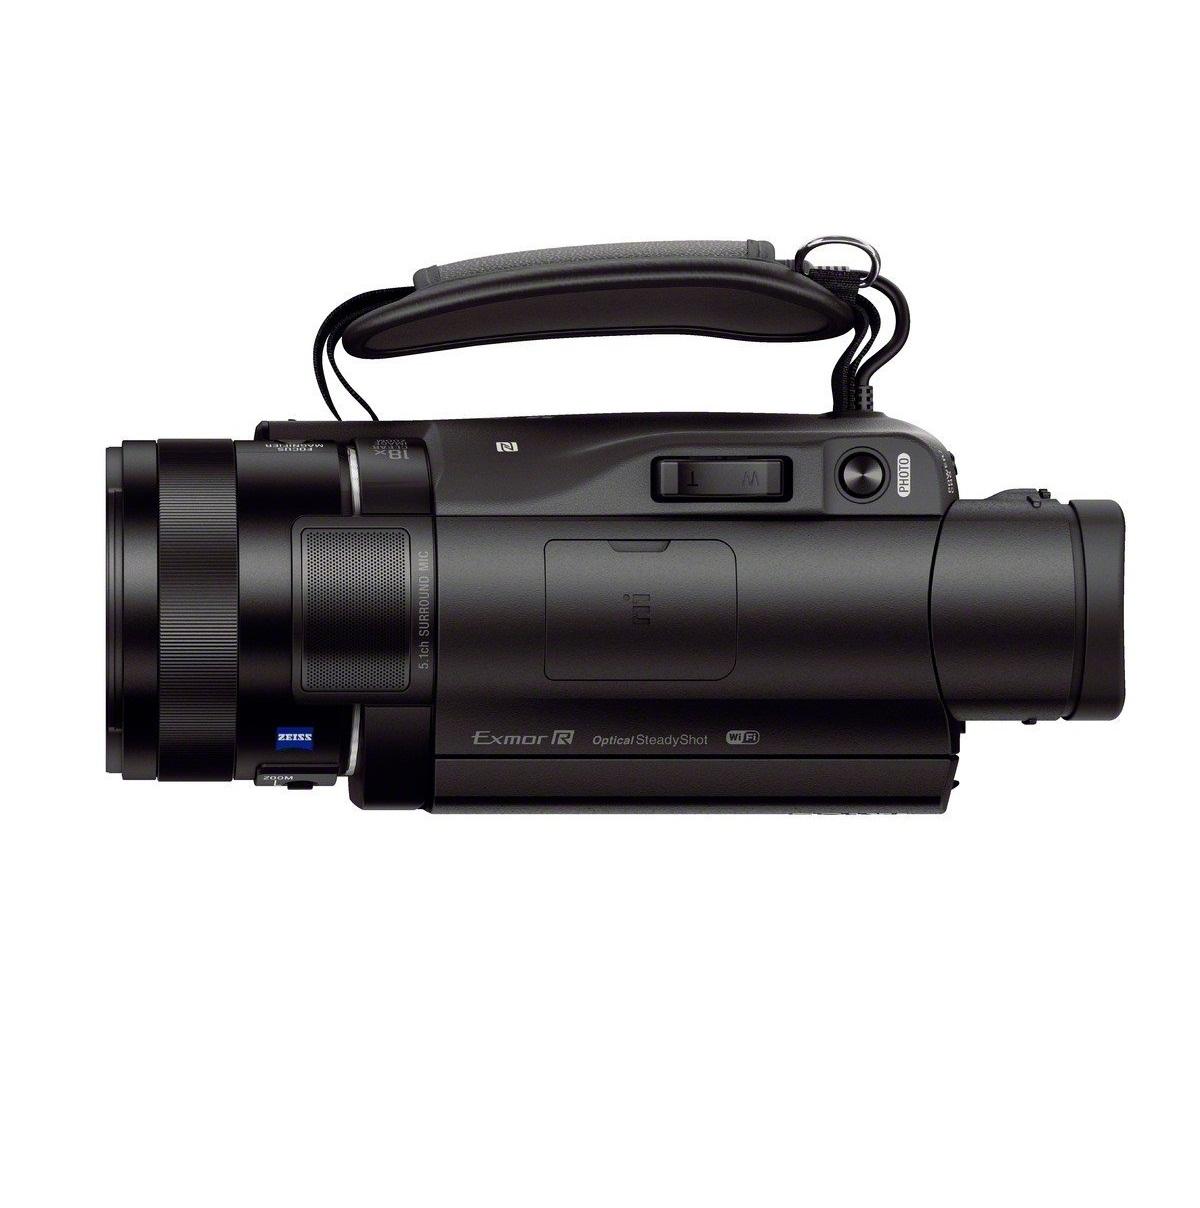 Máy quay KTS Sony Handycam 4K FDR AX40 64Gb - Black